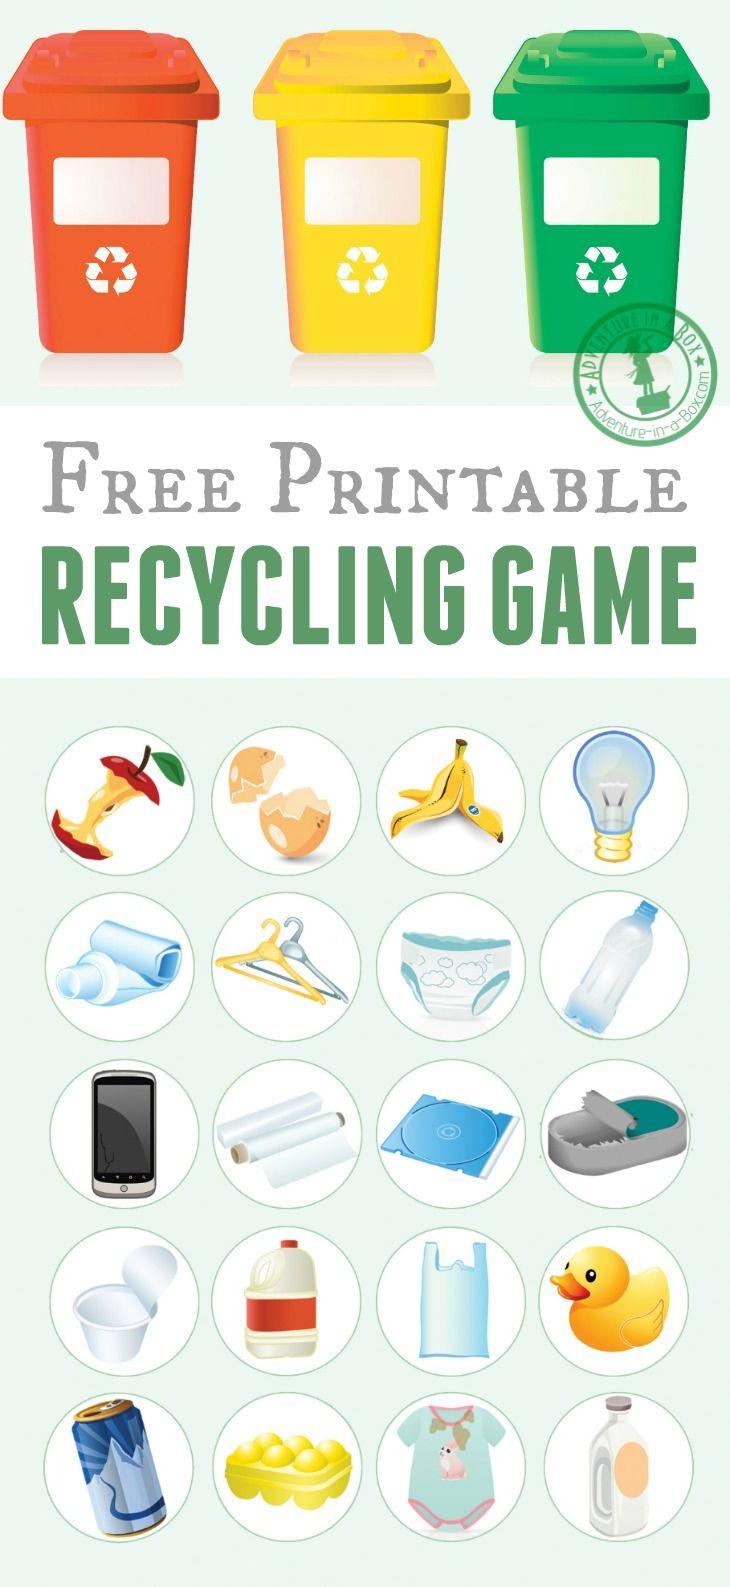 Printable Recycling Game | Free Printable Of The Day | Earth Day | Free Printable Recycling Worksheets